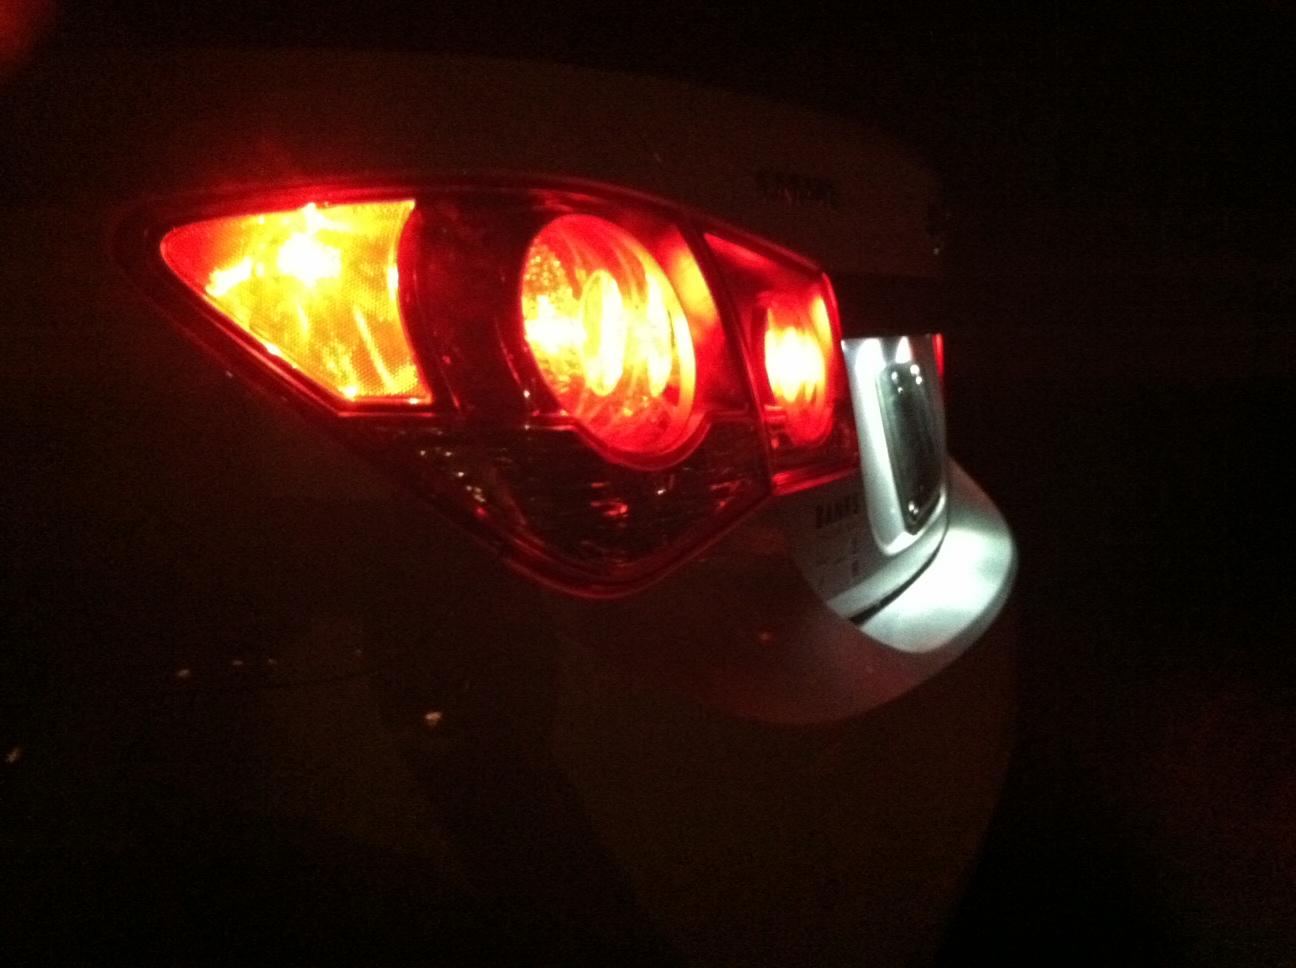 3200d1325645138-led-licence-plate-lights...ight-1.jpg